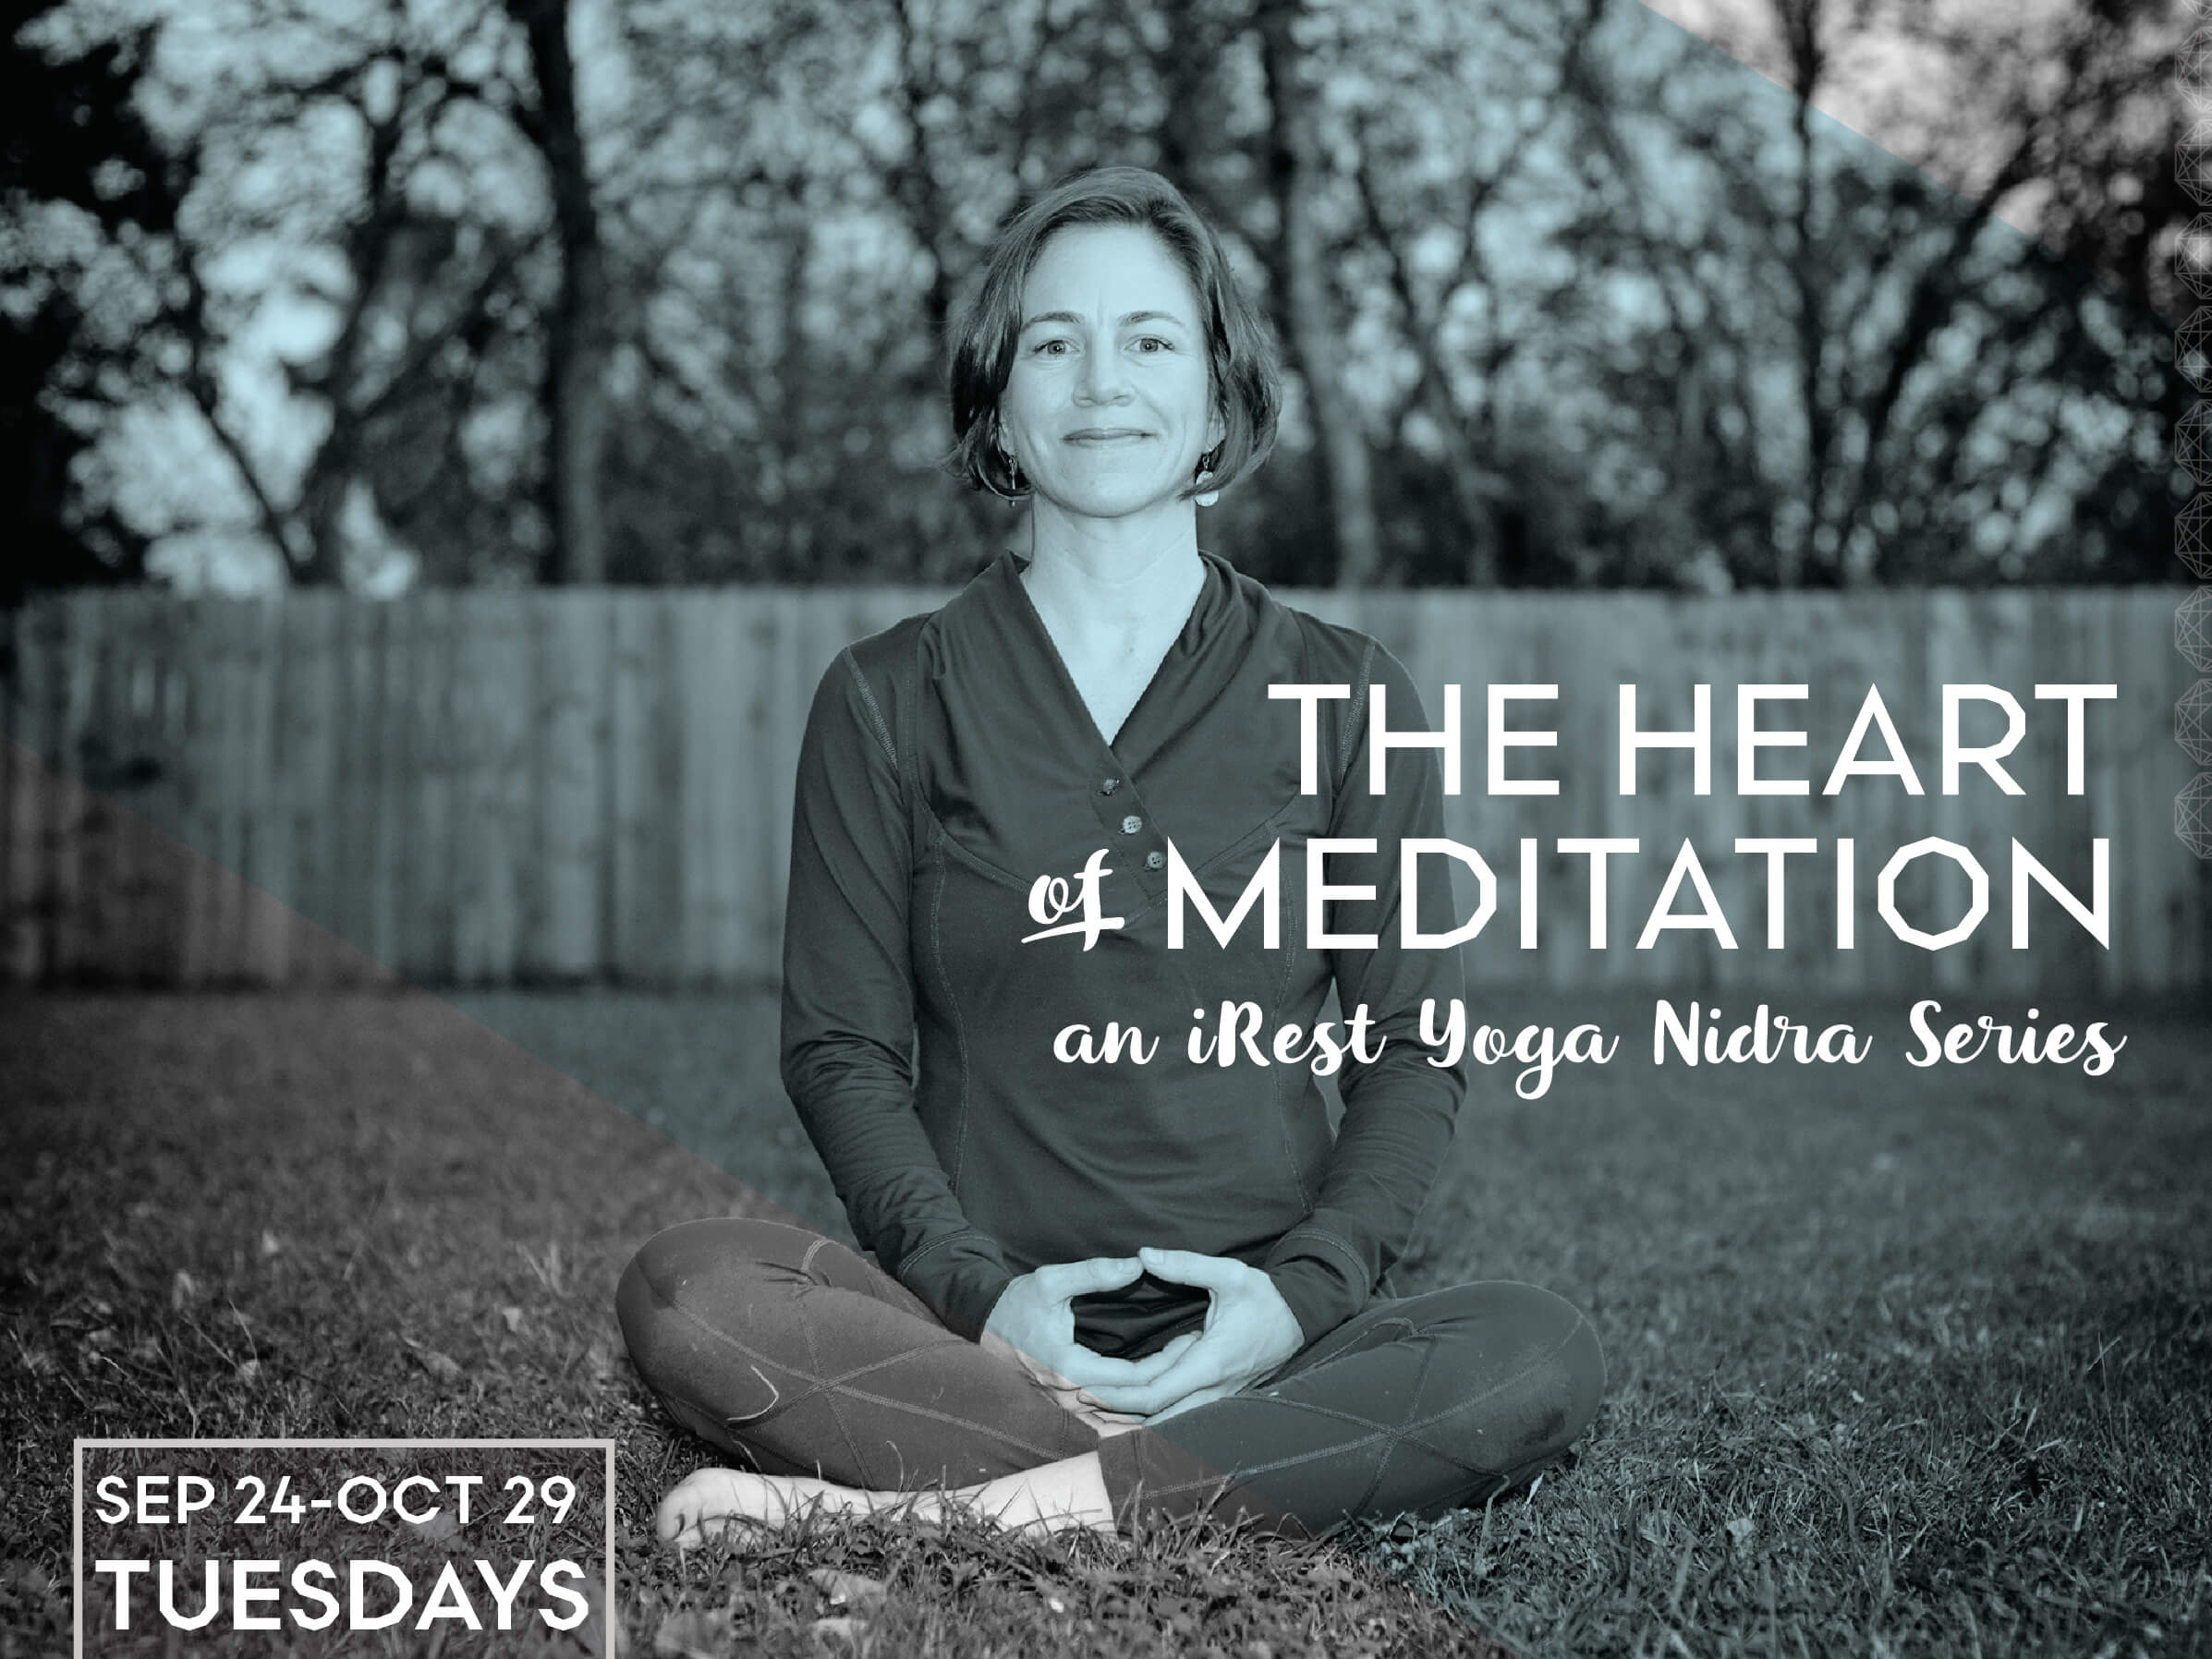 The Heart of Meditation: an iRest Yoga Nidra Series